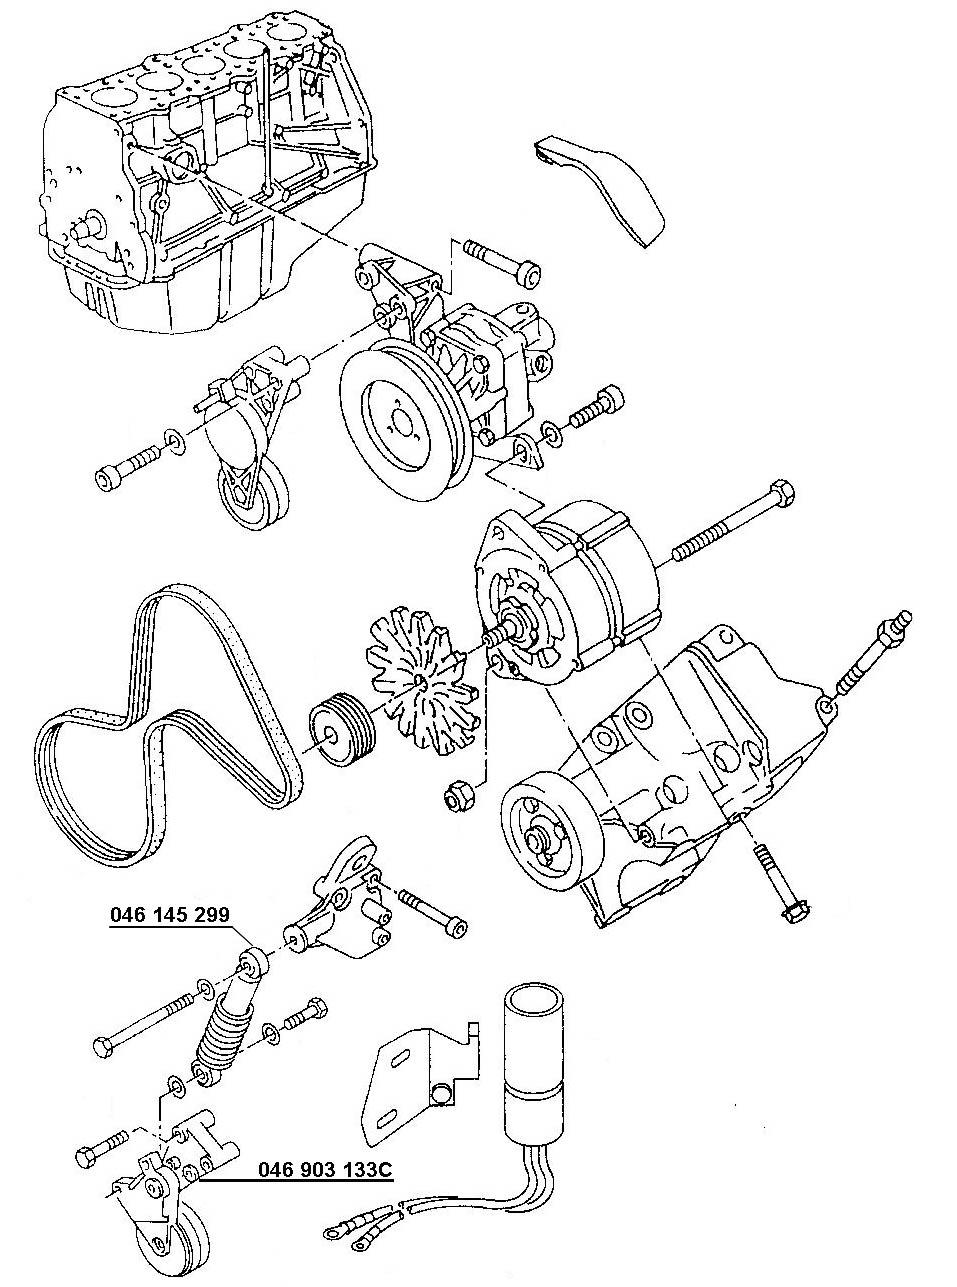 Index Of Files Original Audi A6 2 7t Engine Diagram Vw3 2008 06 27 0016